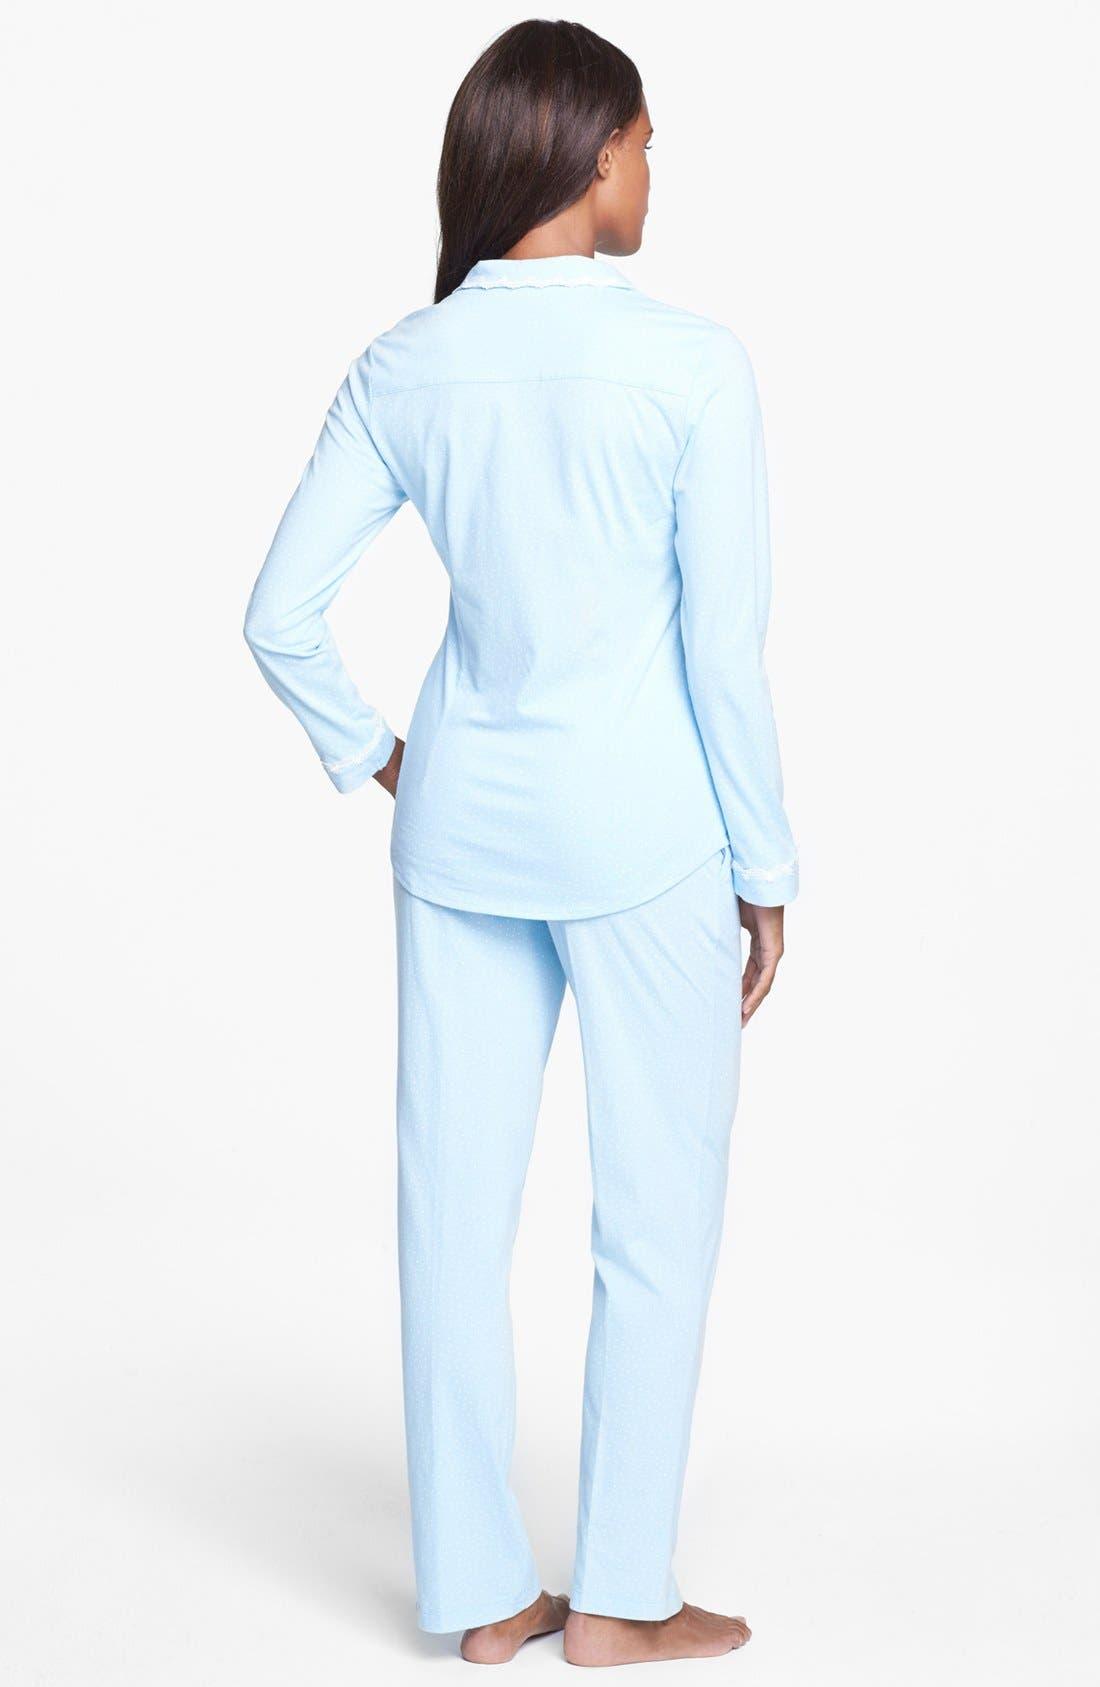 'Buona Notte' Pajamas,                             Alternate thumbnail 2, color,                             Blue/ Winter White Dots